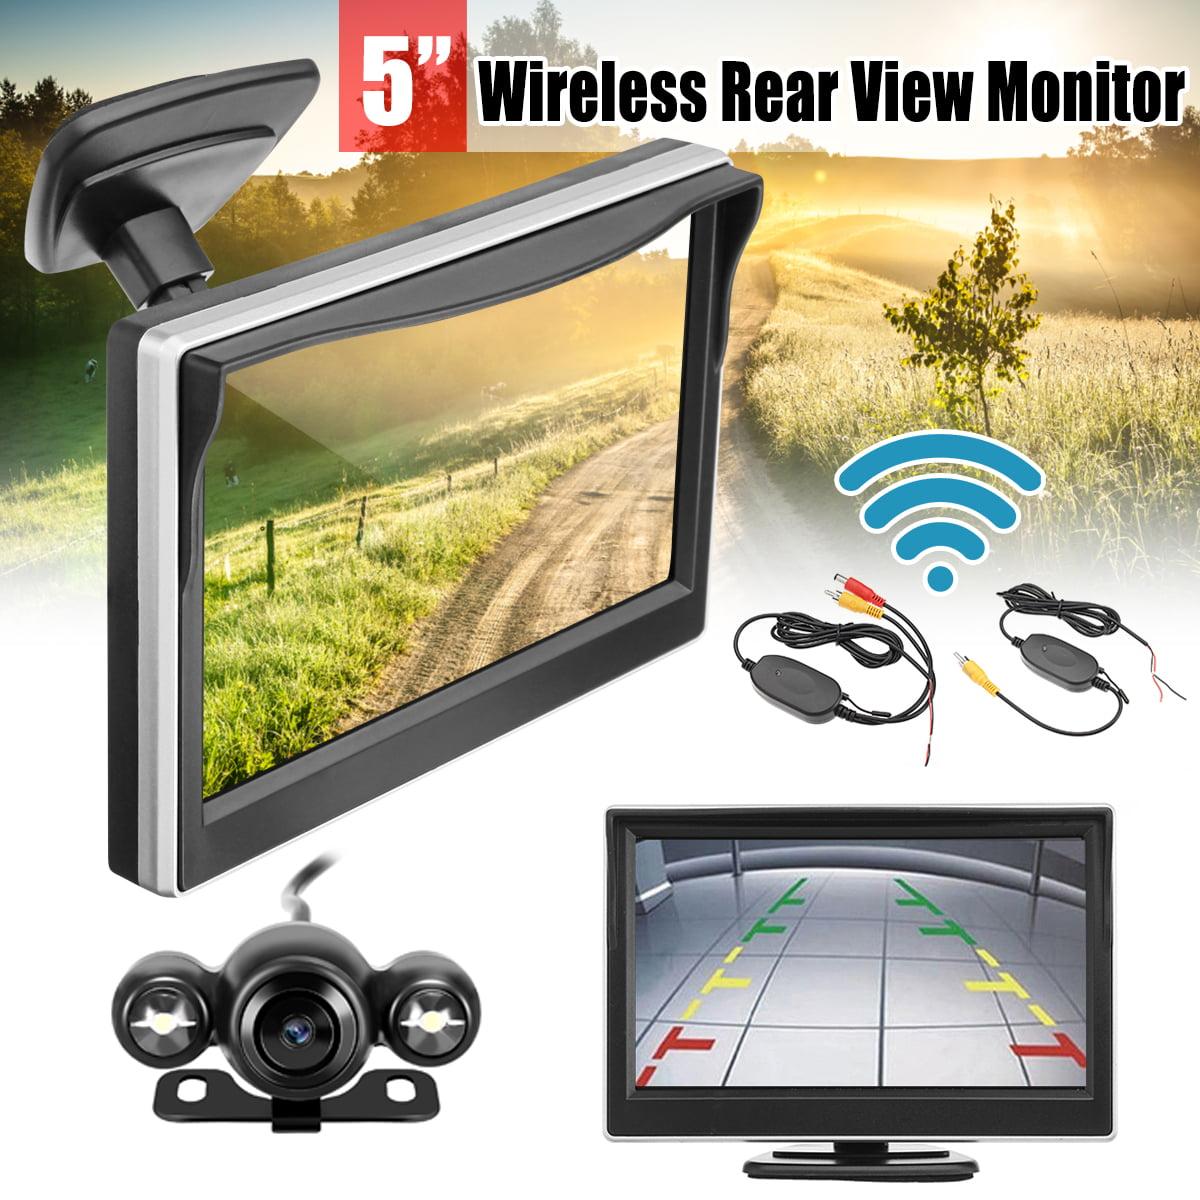 5inch LCD Wireless Car Rear View Backup Monitor with Sensor Parking LED Night Vision Camera Kit